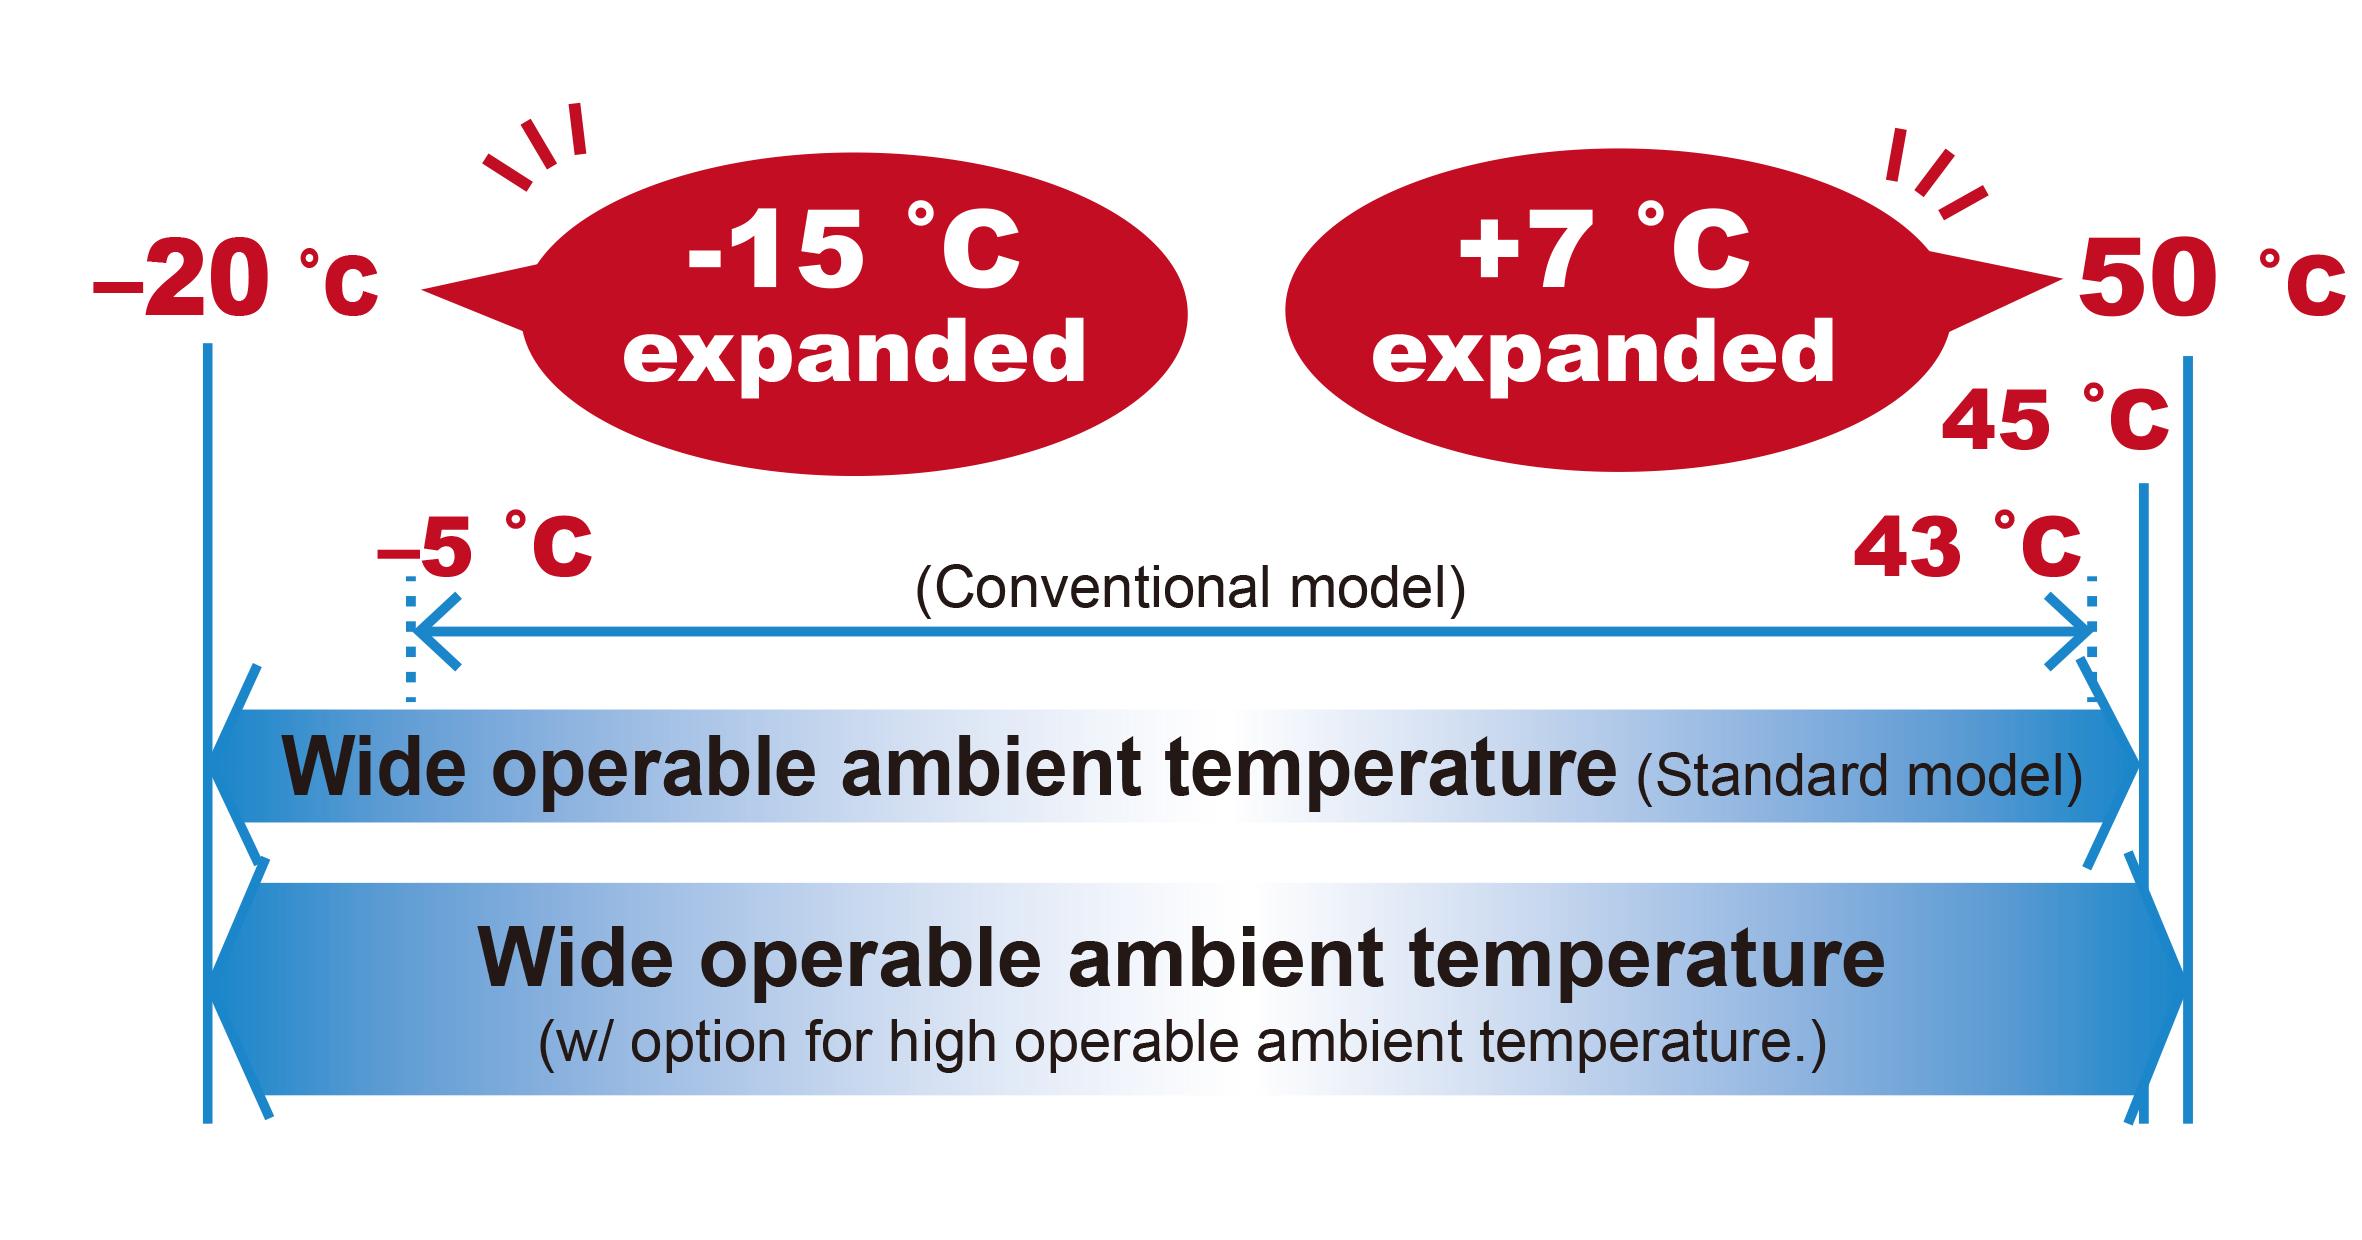 Wider operable ambient temperature range